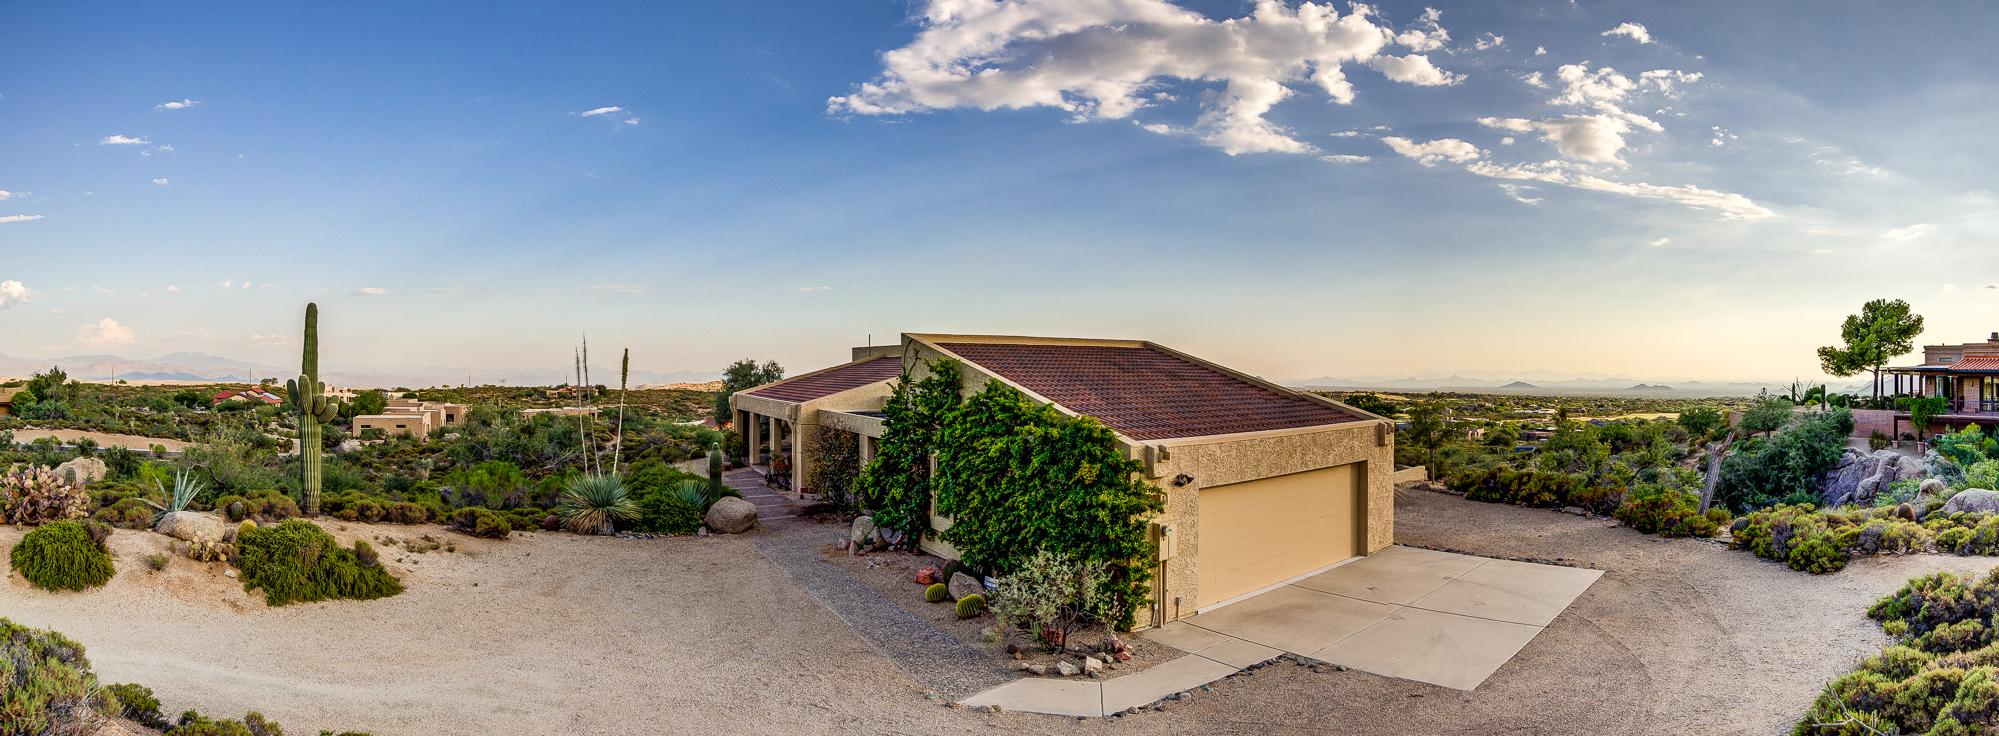 11441 East Cottontail Road, Cave Creek, Arizona - Panorama